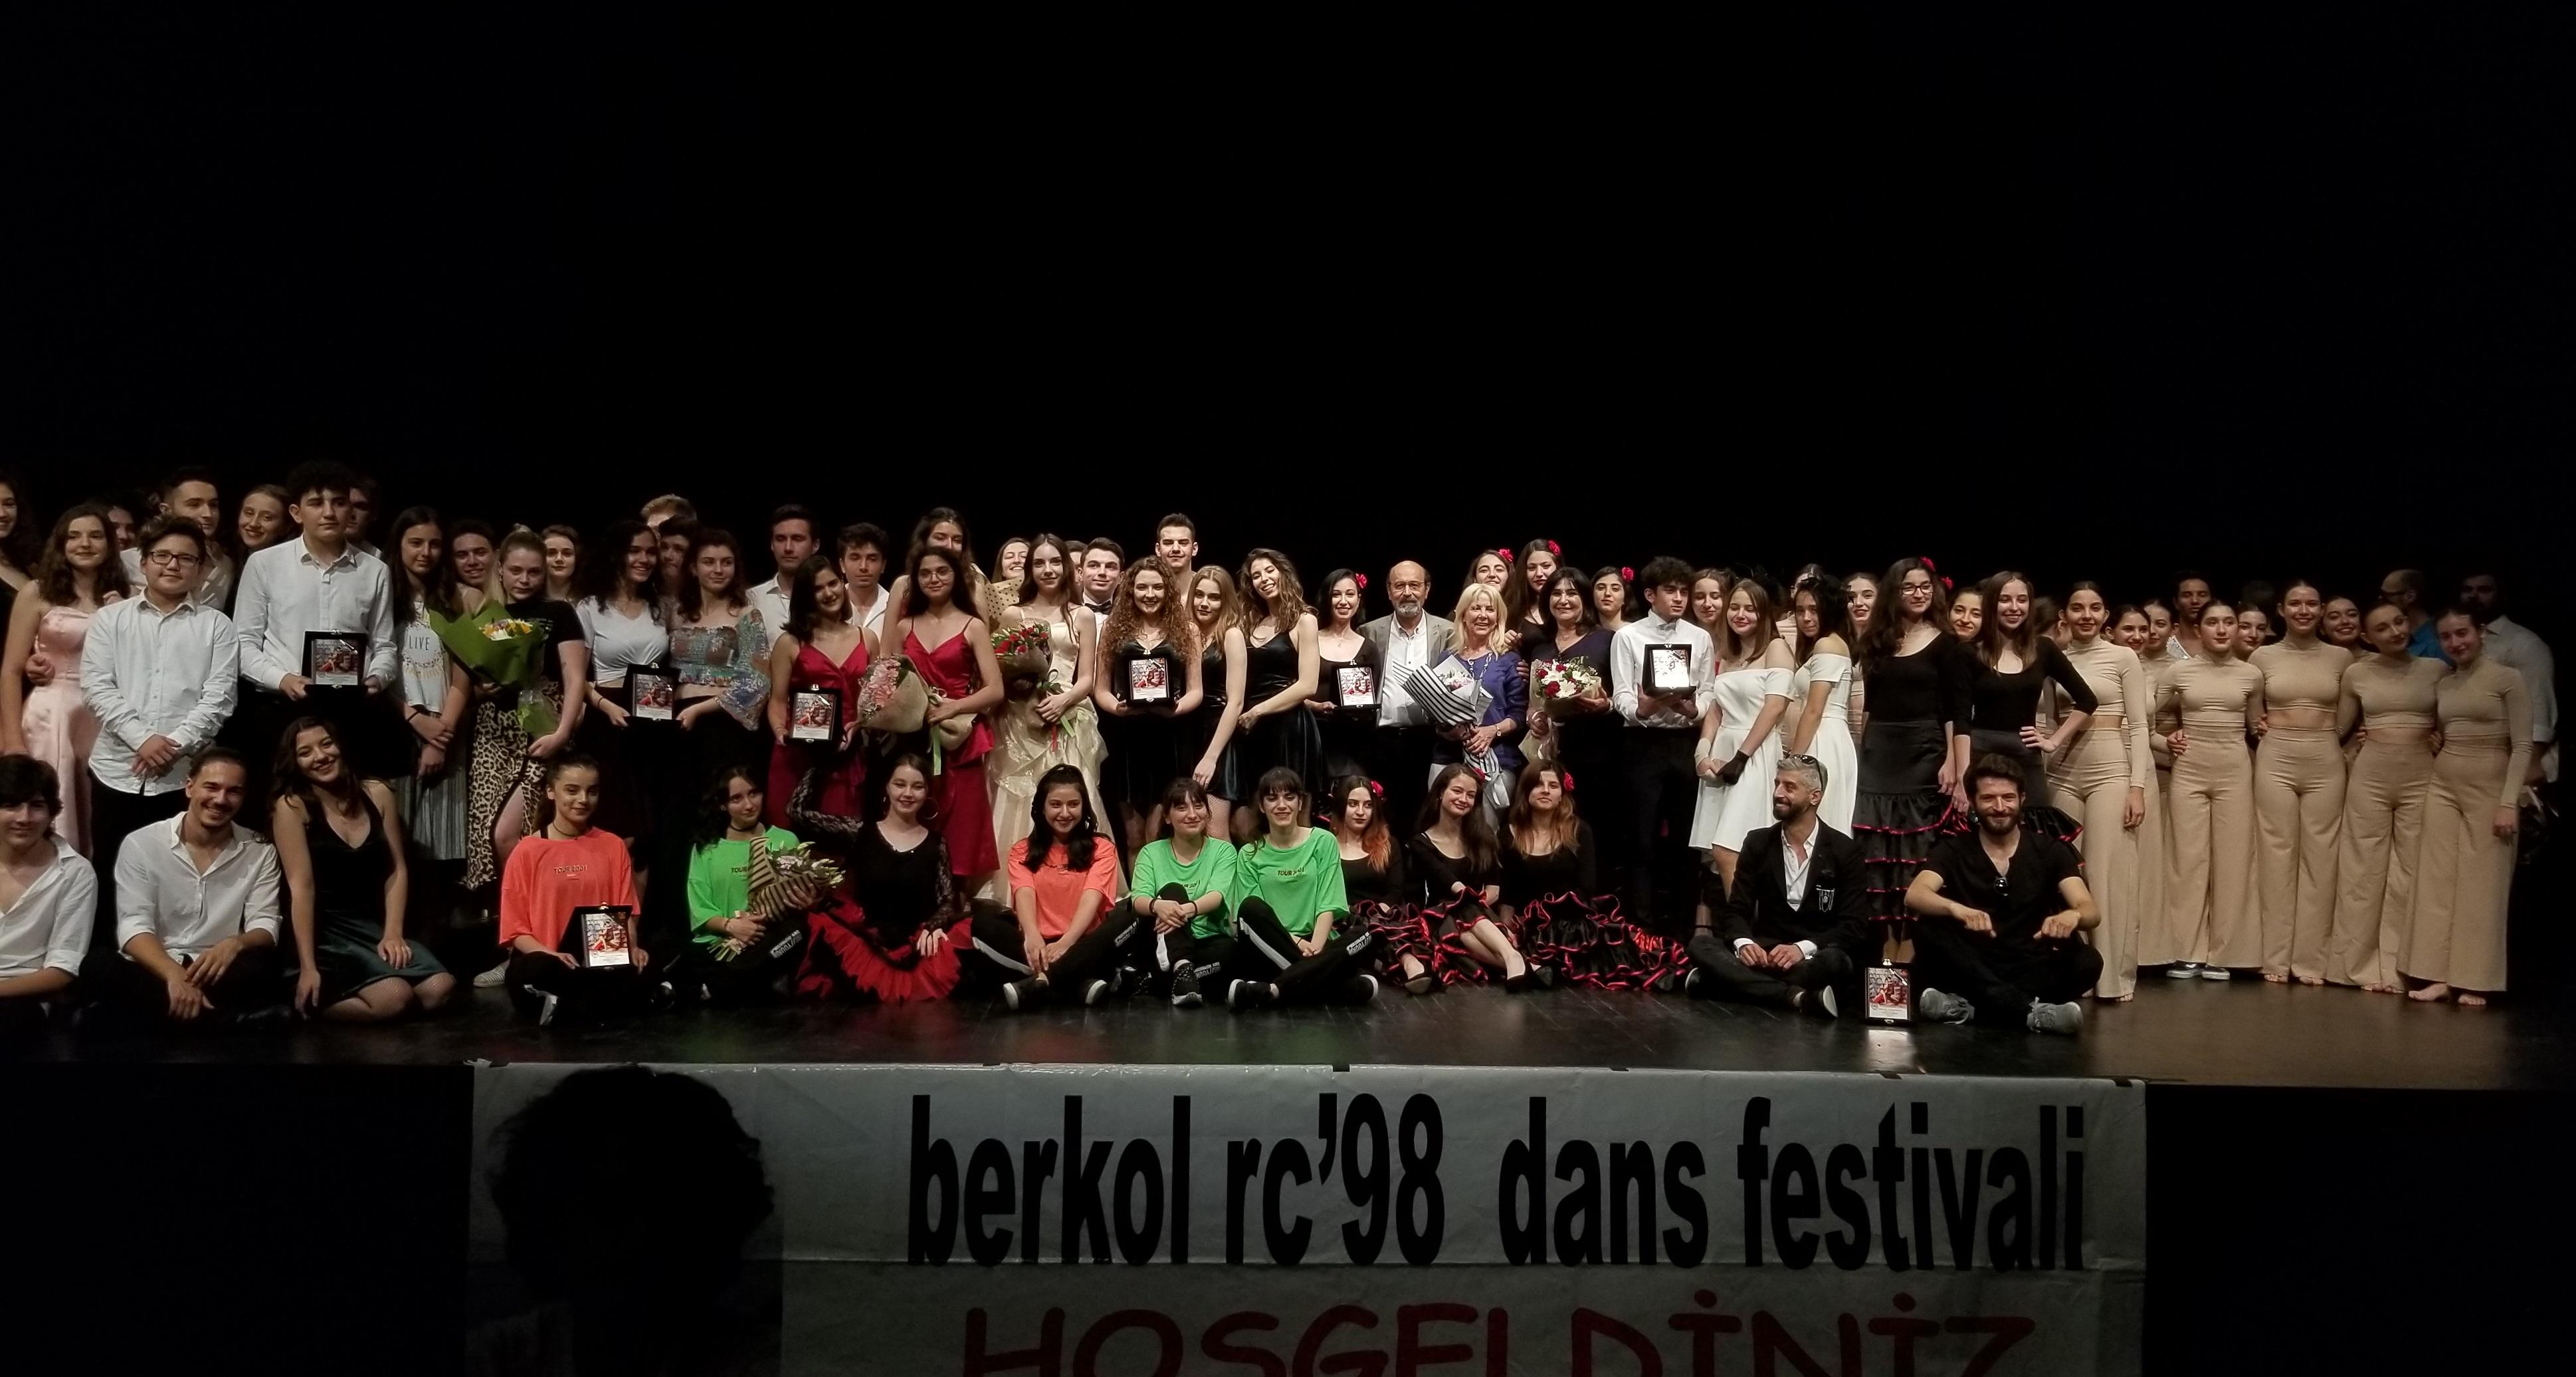 Berkol RC'98 10. Dans Festivali